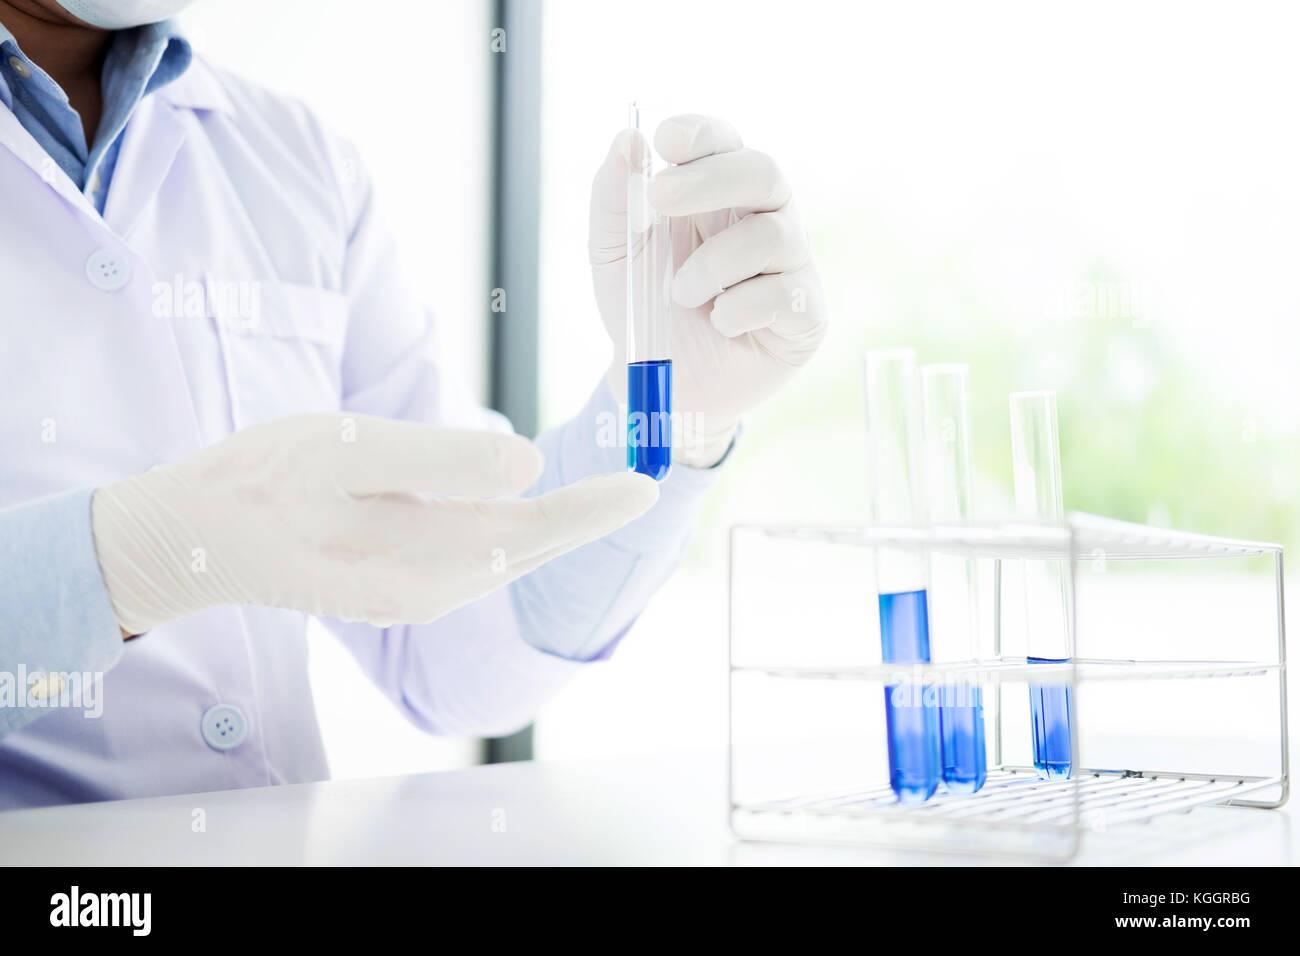 Laboratory Chemical Preparation Hand Stock Photos Amp Laboratory Chemical Preparation Hand Stock